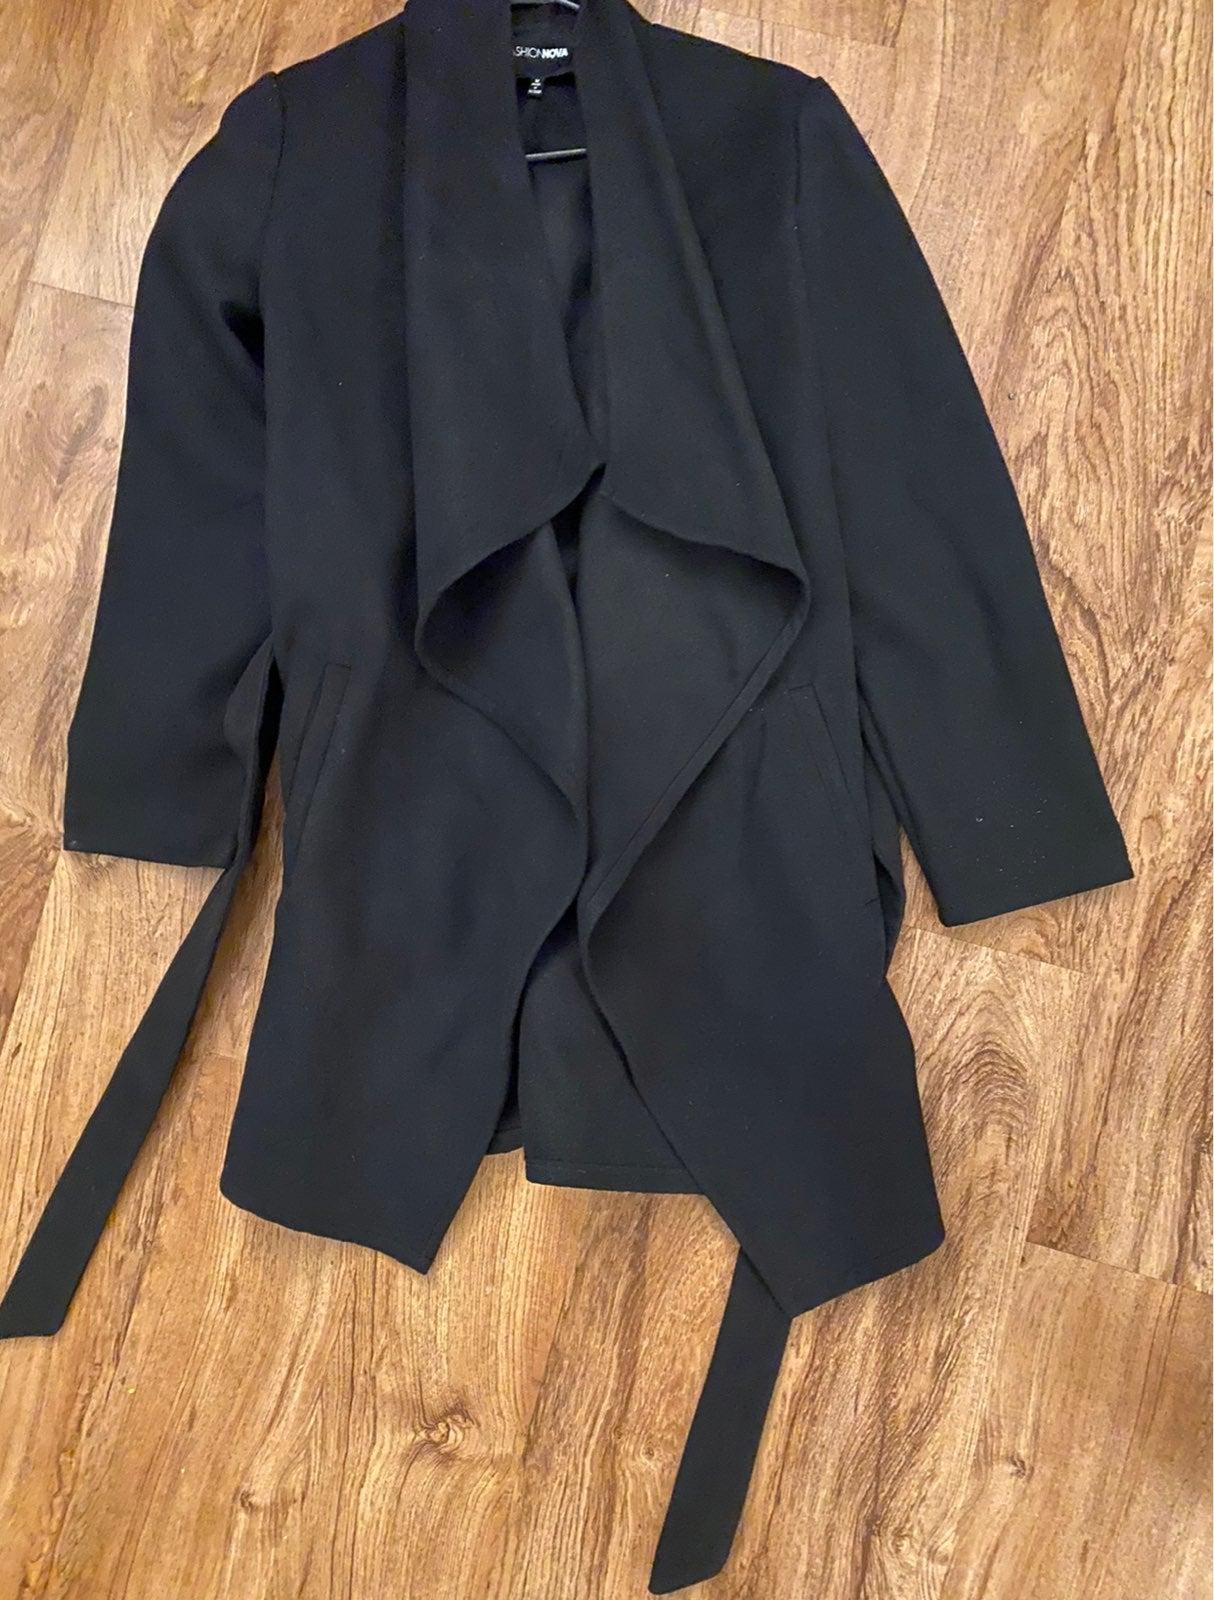 Black Duster Jacket